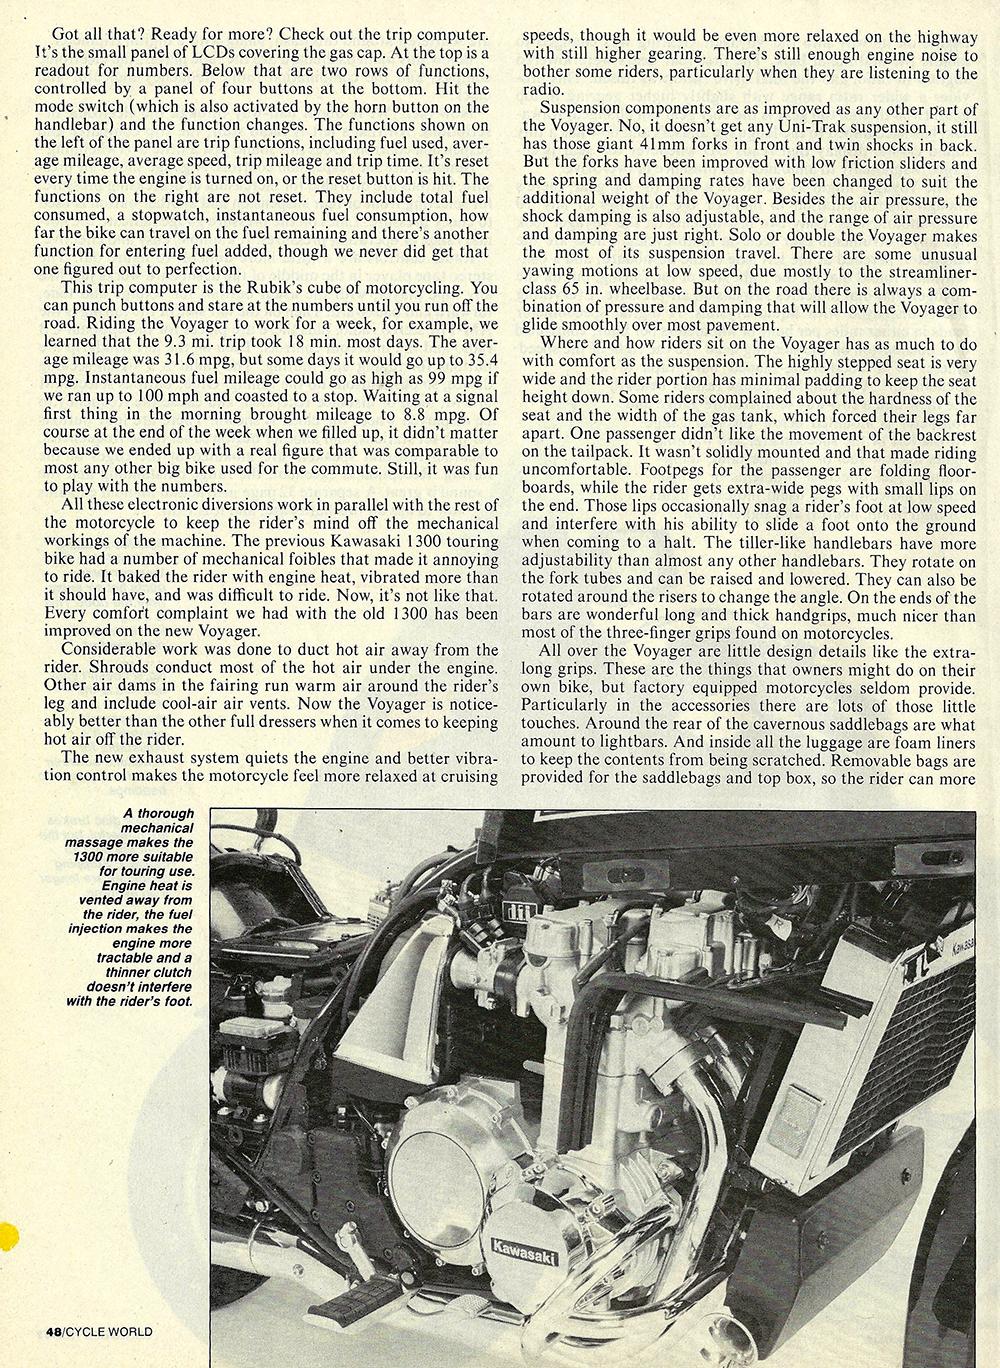 1983 Kawasaki Voyager 1300 road test 05.jpg